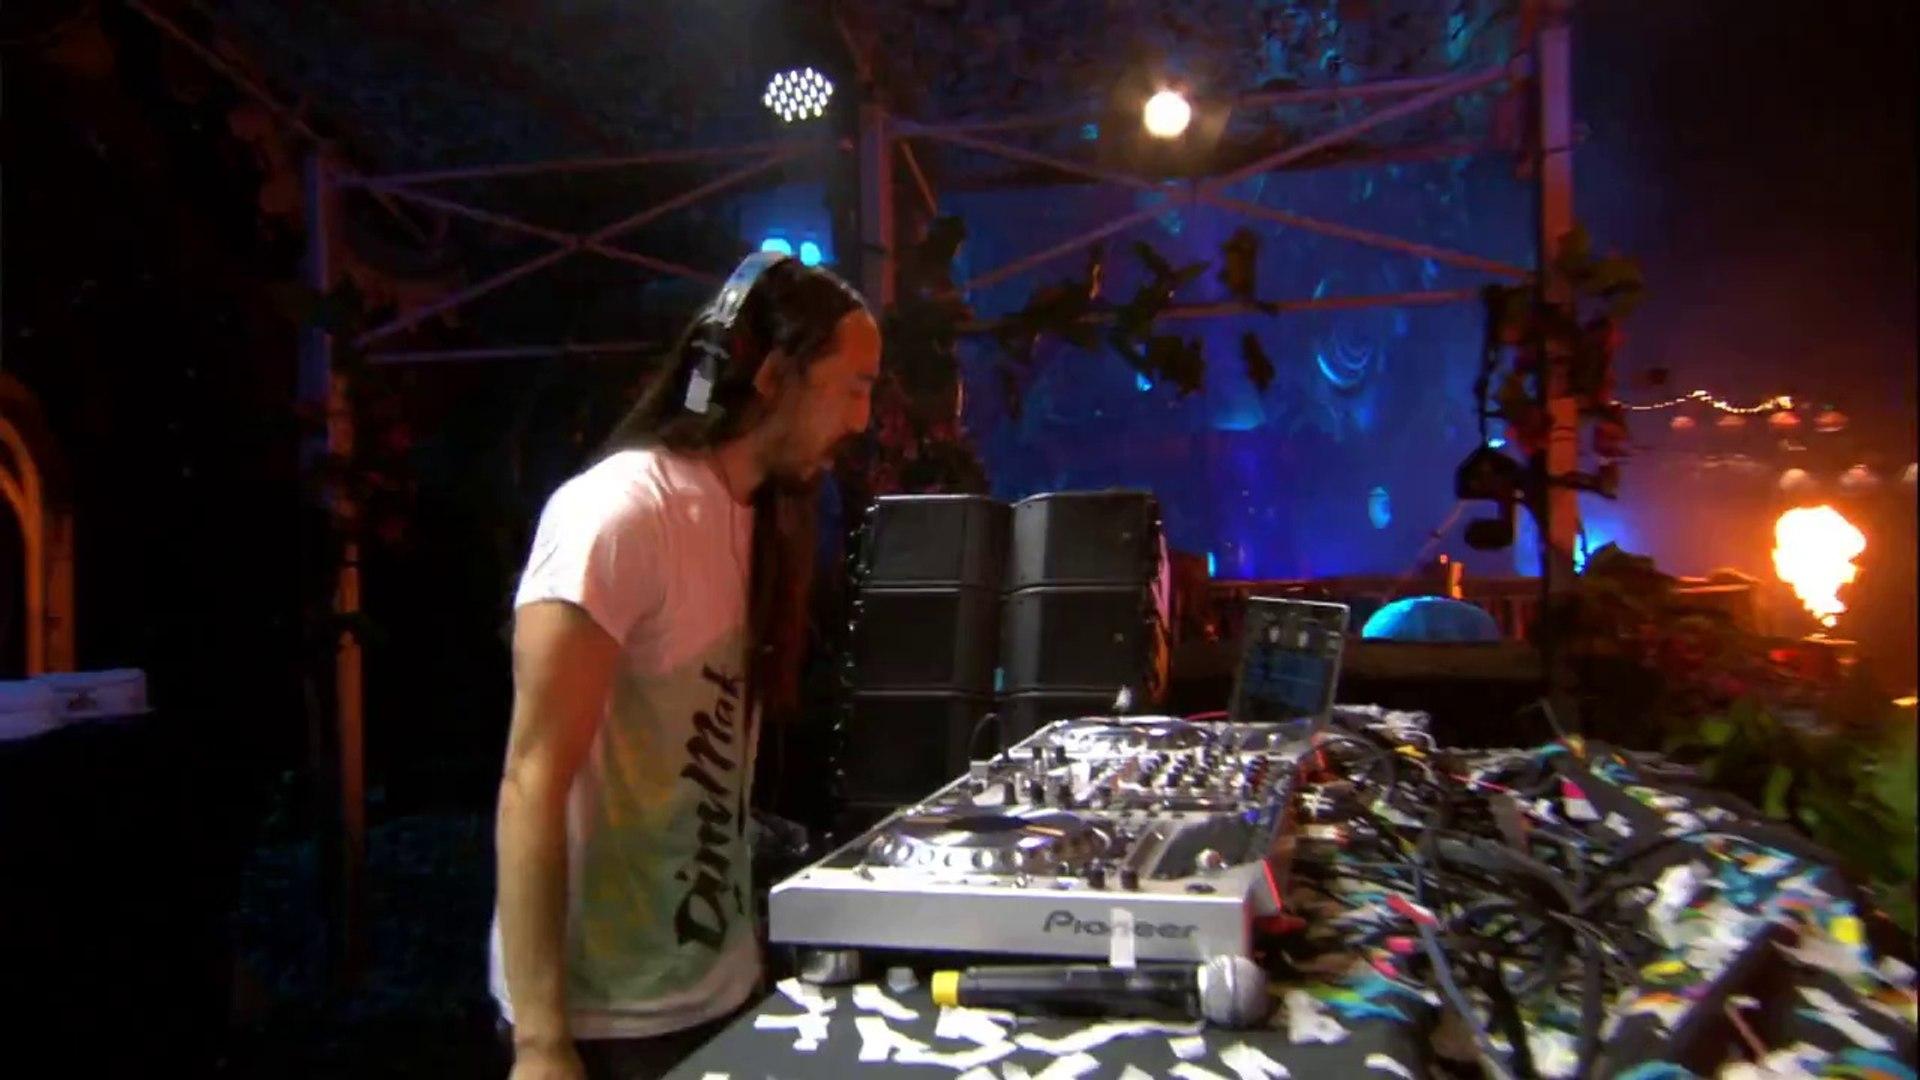 Steve Aoki - Live at Tomorrowland 2014 FULL SET MAINSTAGE